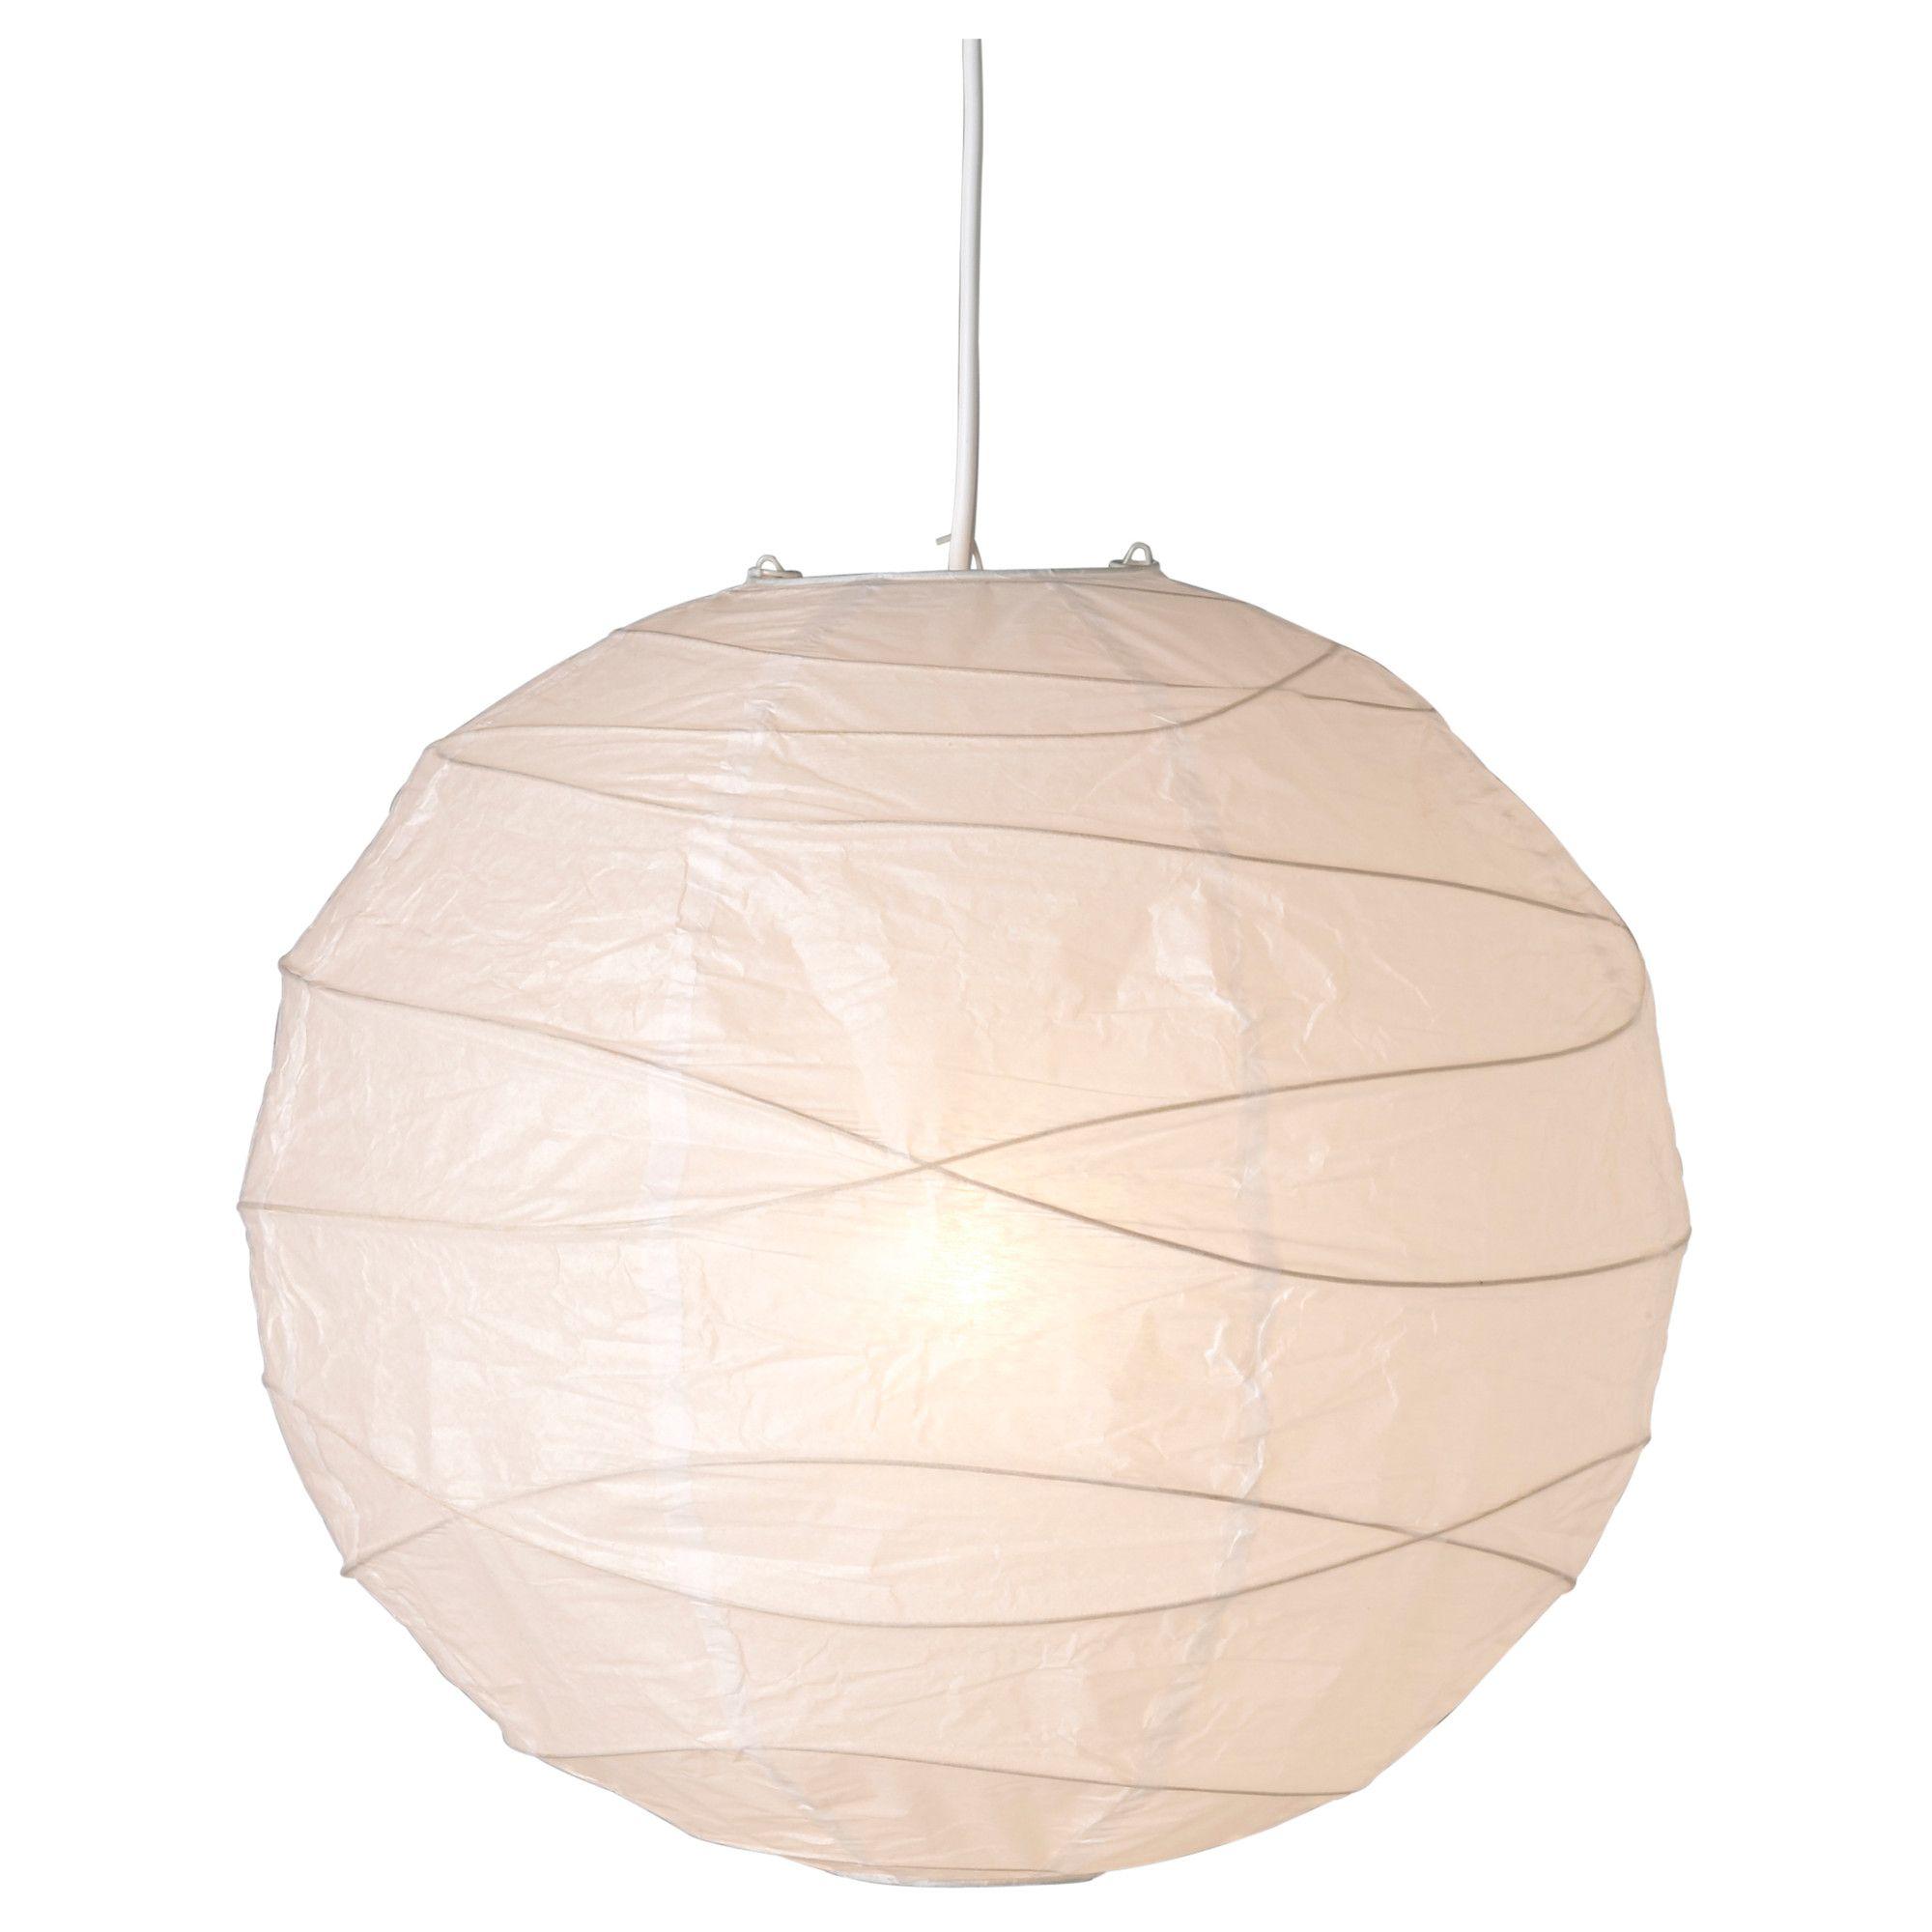 Regolit Pendant Lamp Shade White 17 Ikea In 2020 Ikea